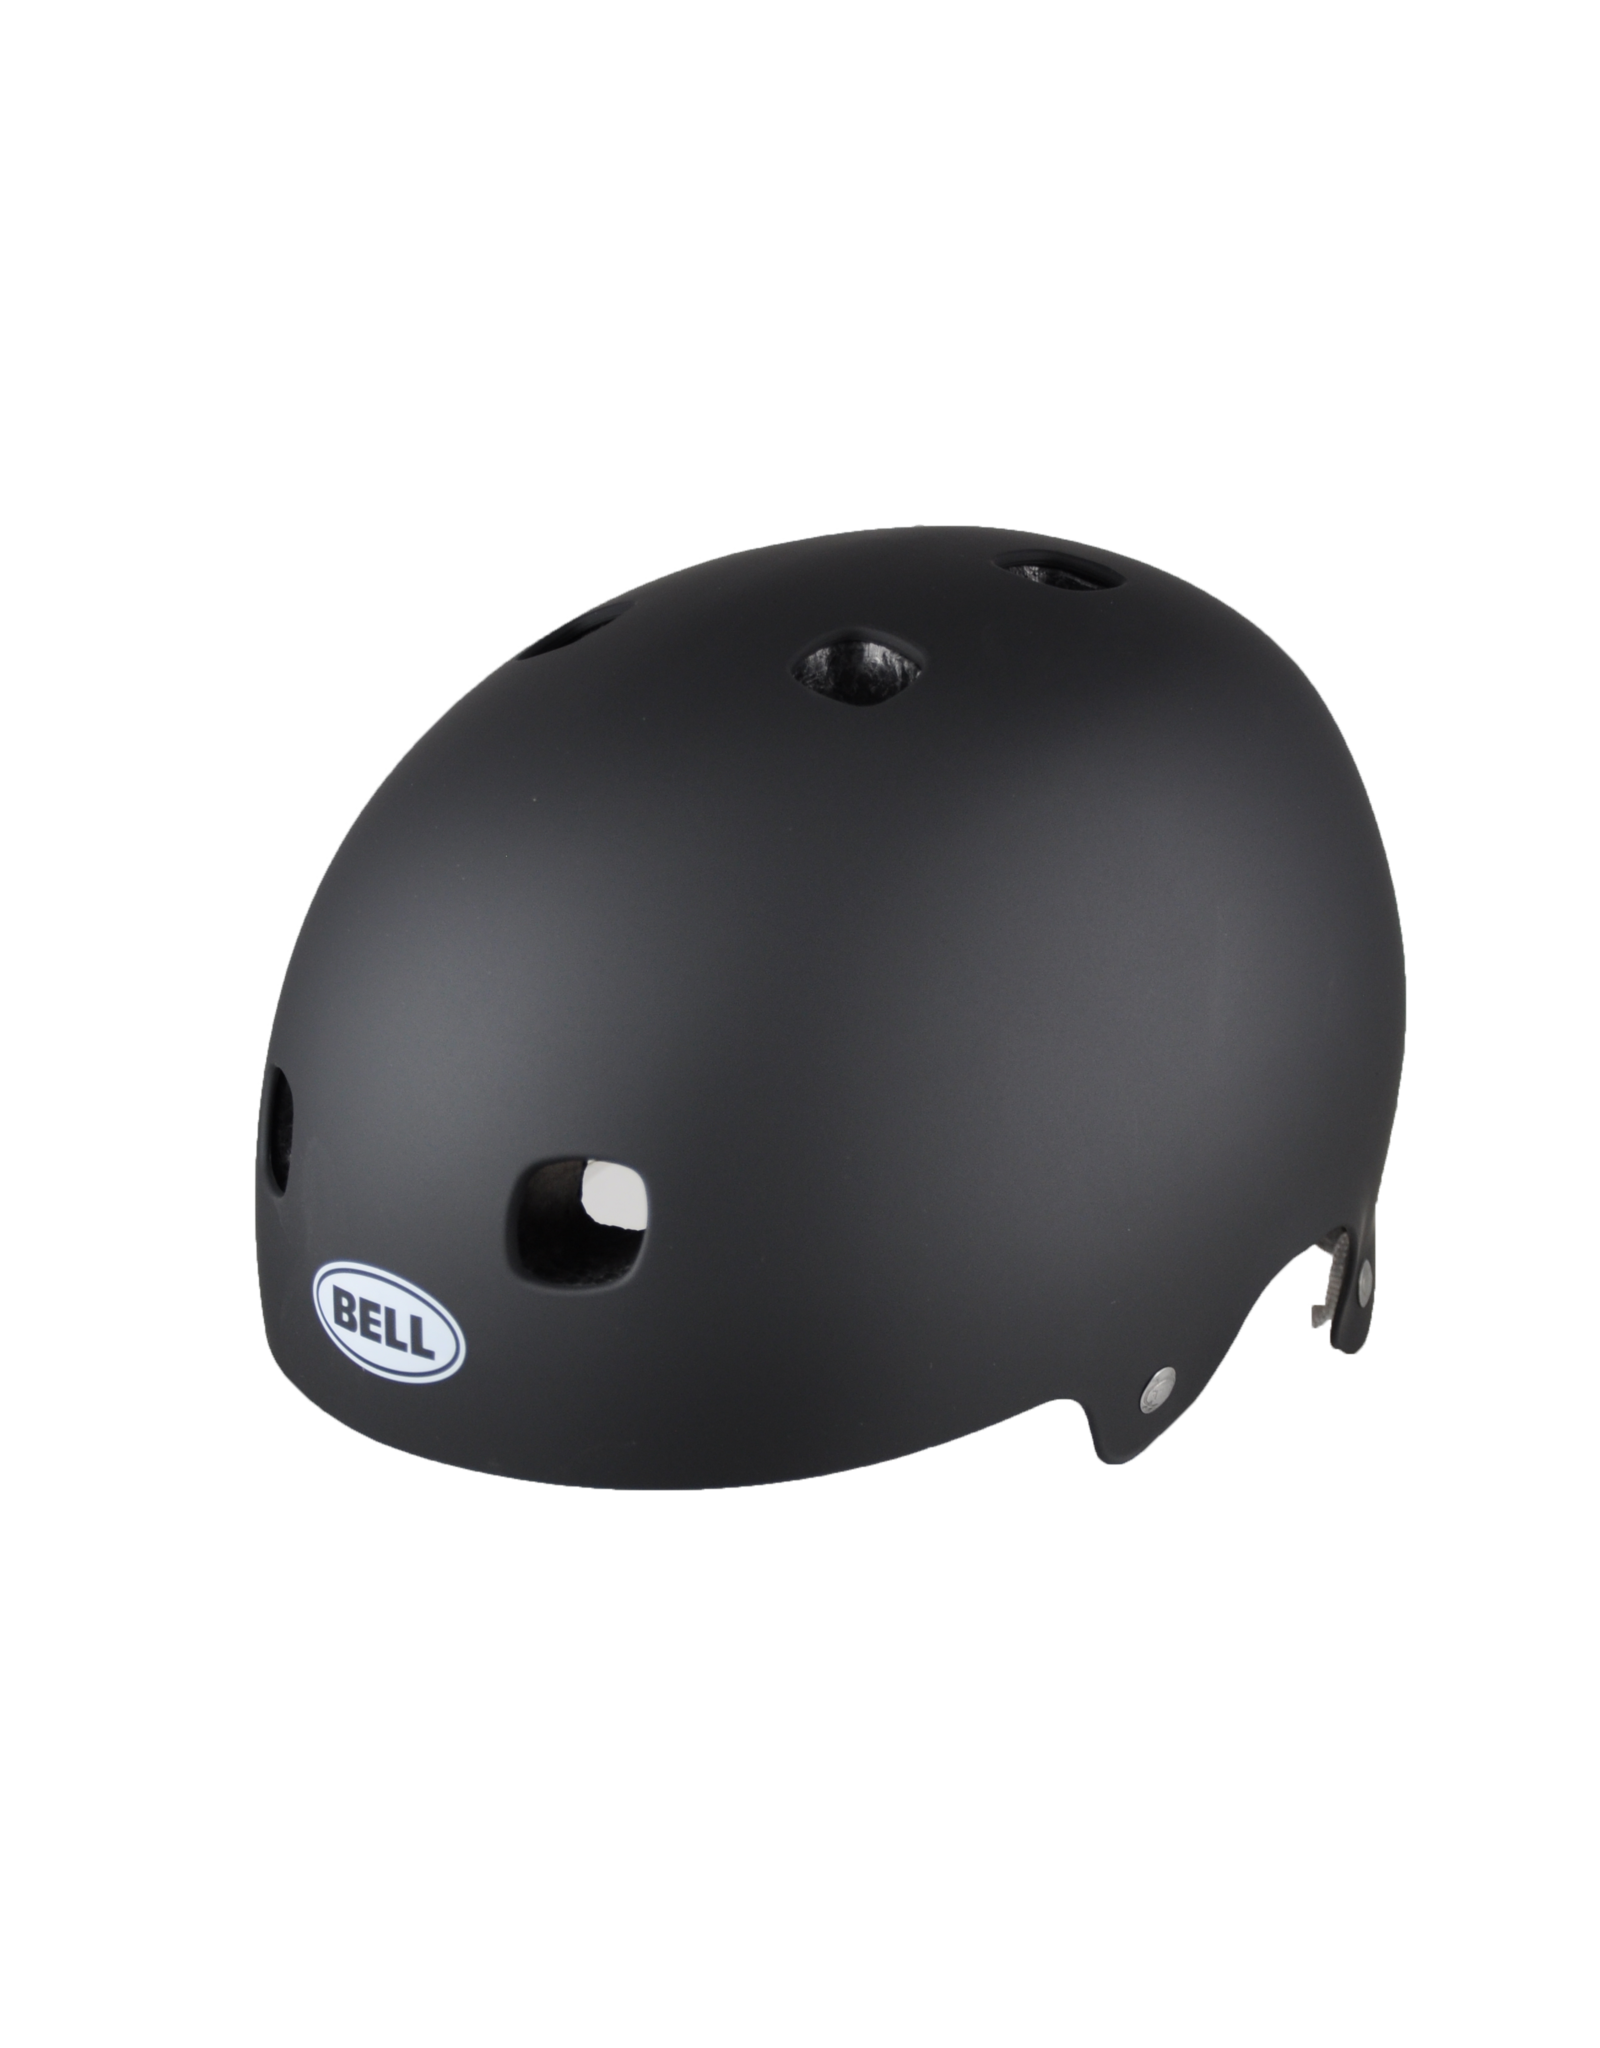 Bell fietshelm kind Black mat